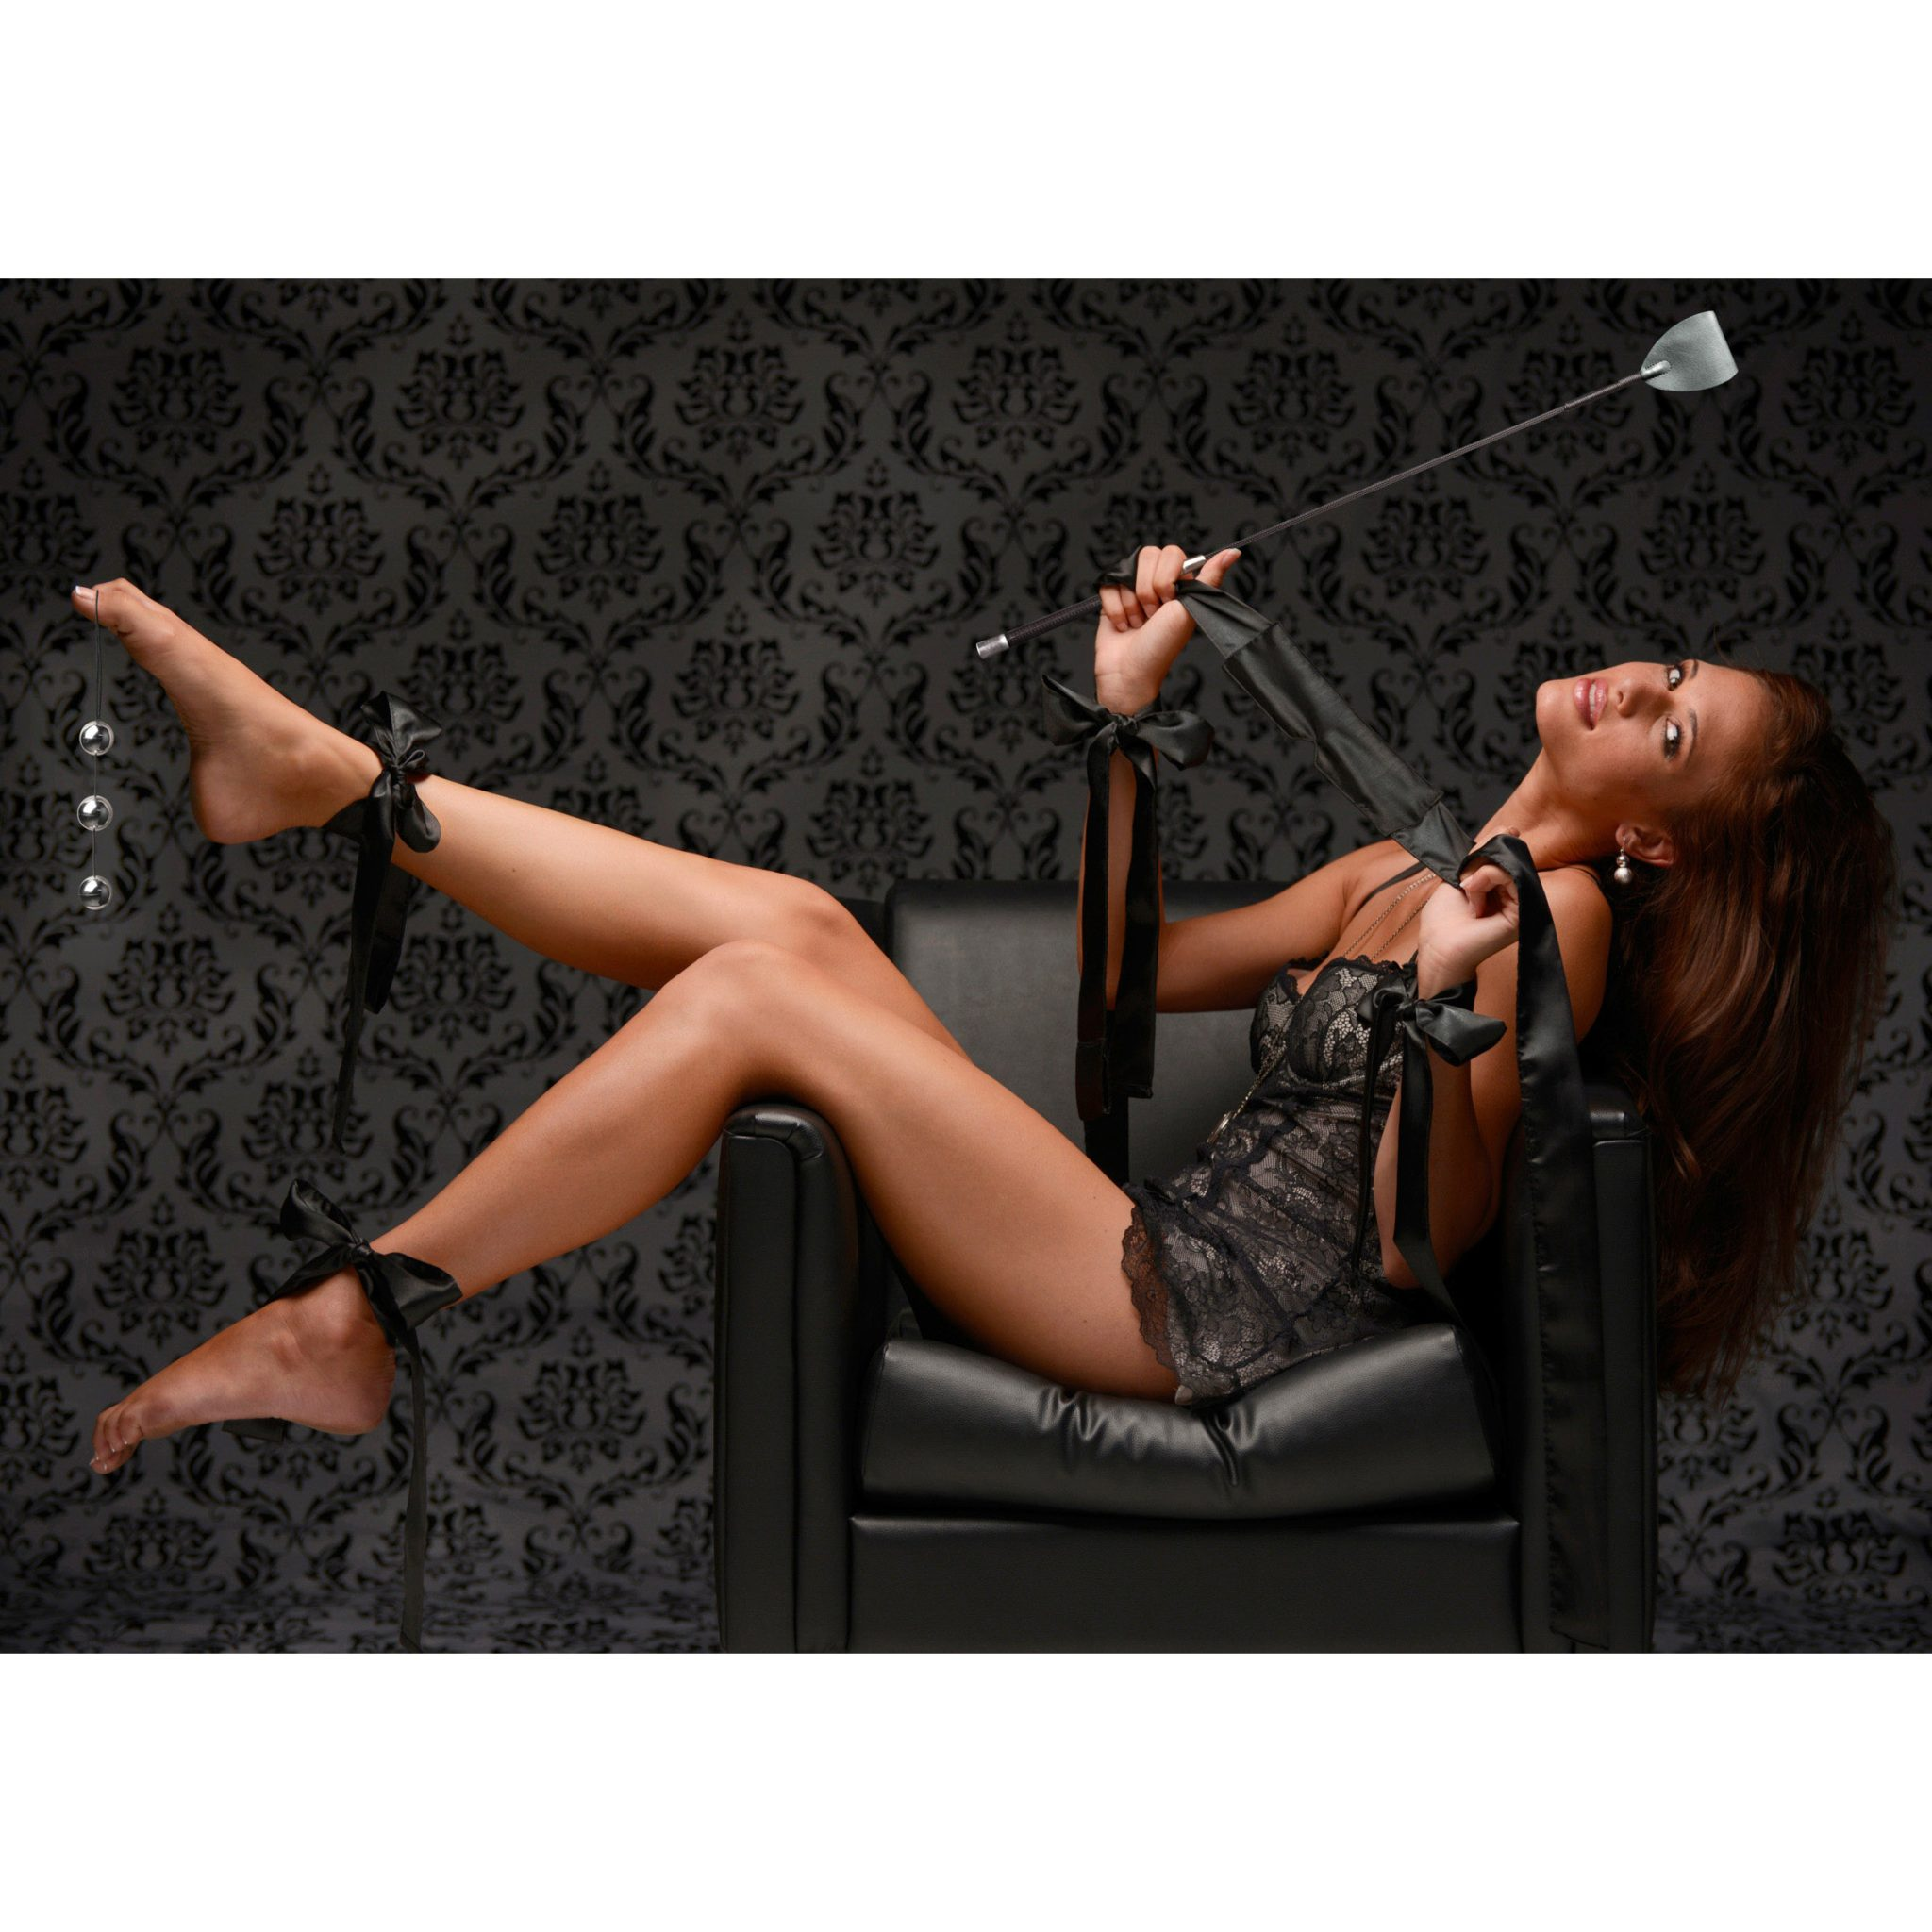 GreyGasms 7 Piece Erotic Bondage Play Kit